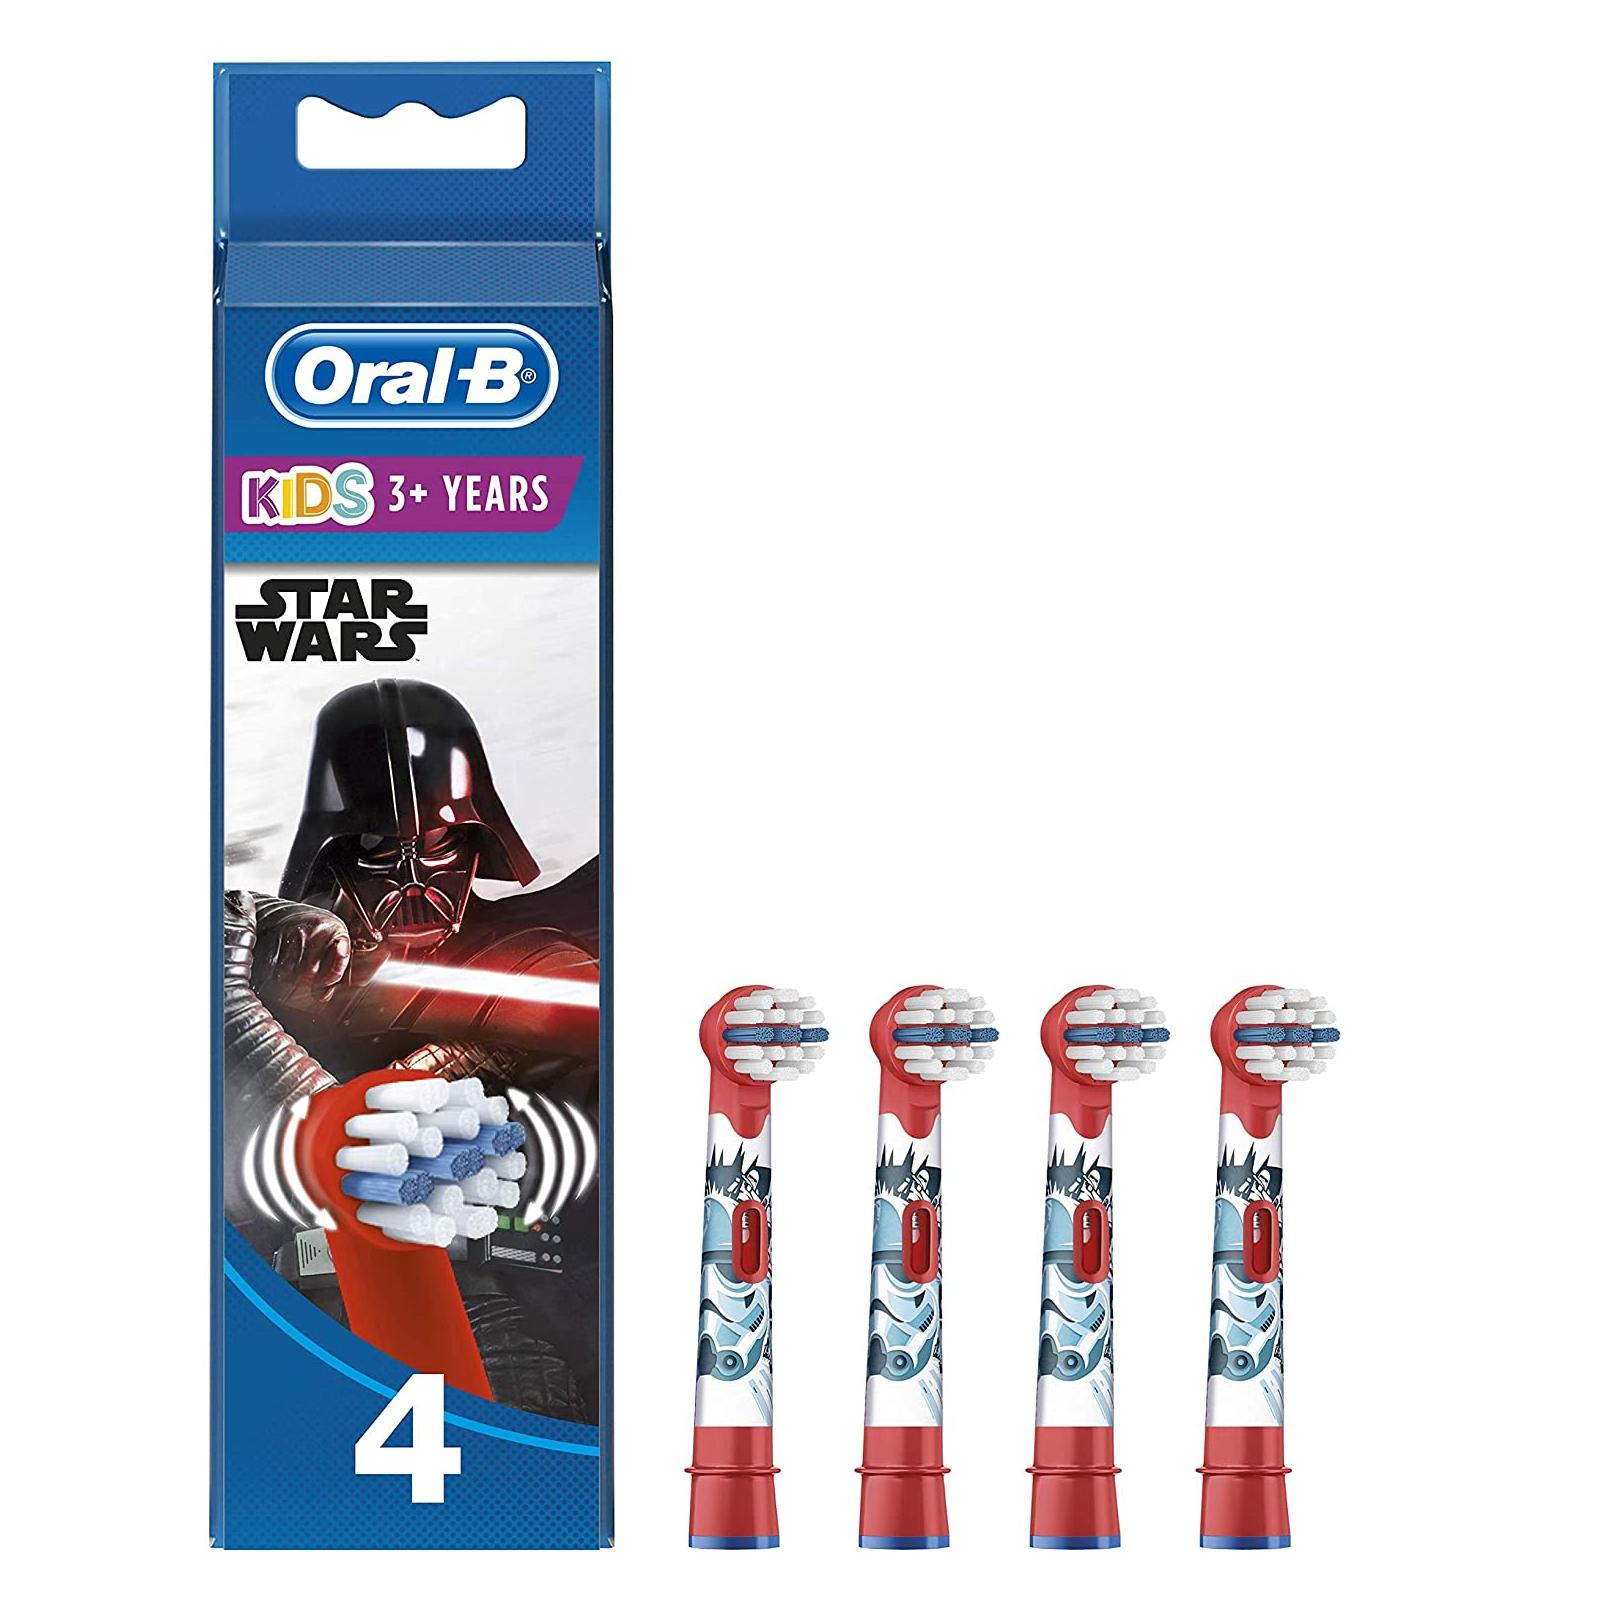 EB10-4 Stages Power gyermek fogkefe pótfej Star Wars 4db